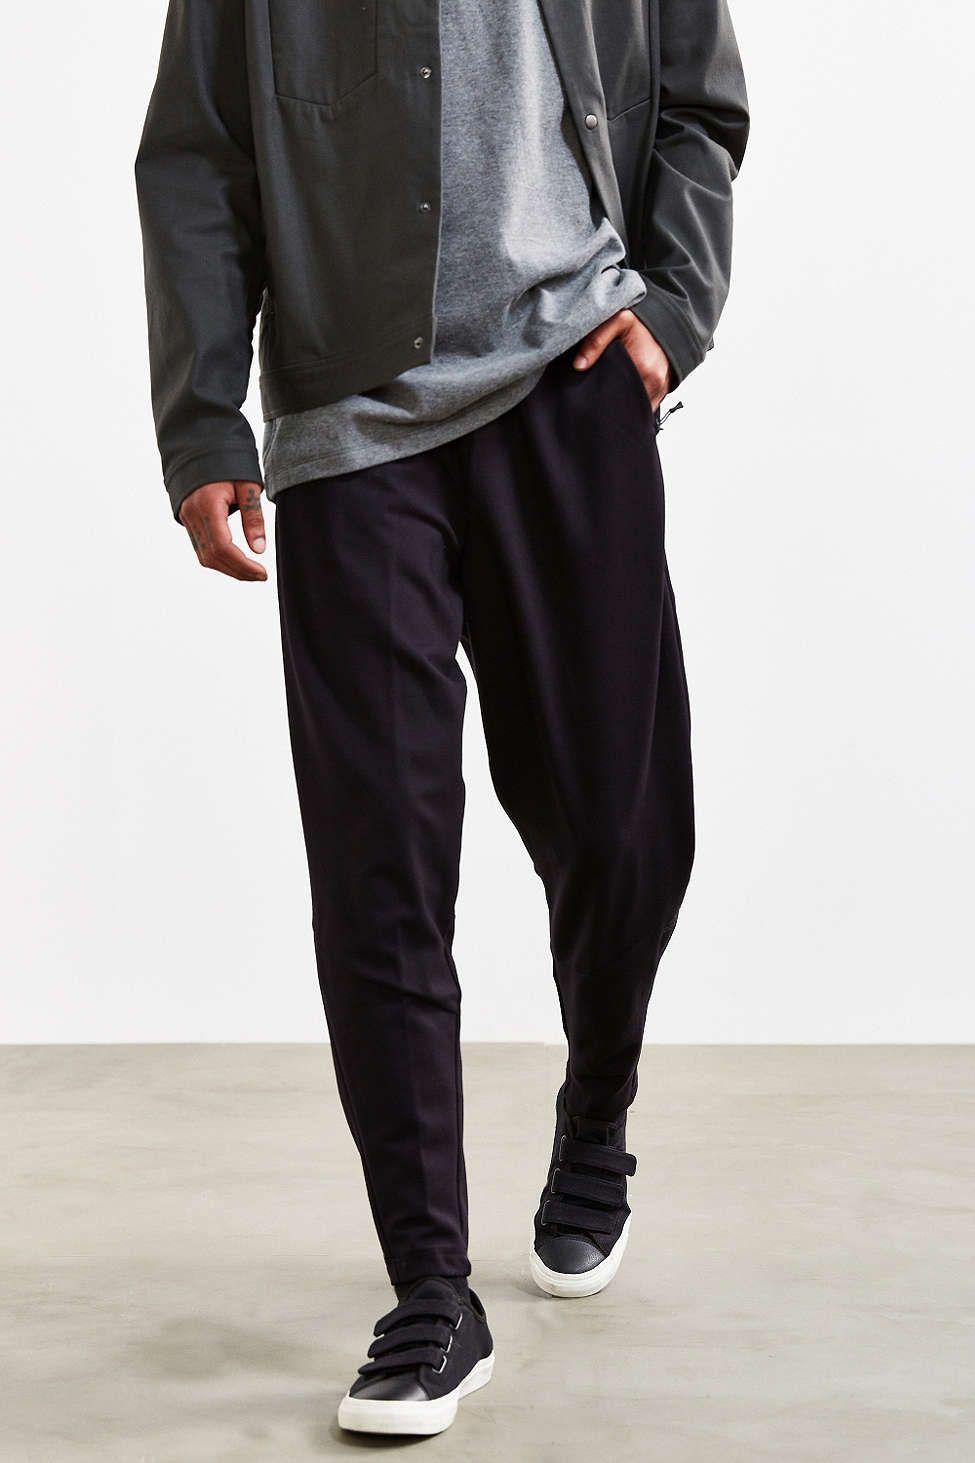 Adidas Tapered TRACK PANT Pinterest Urban uutfitters, Adidas y